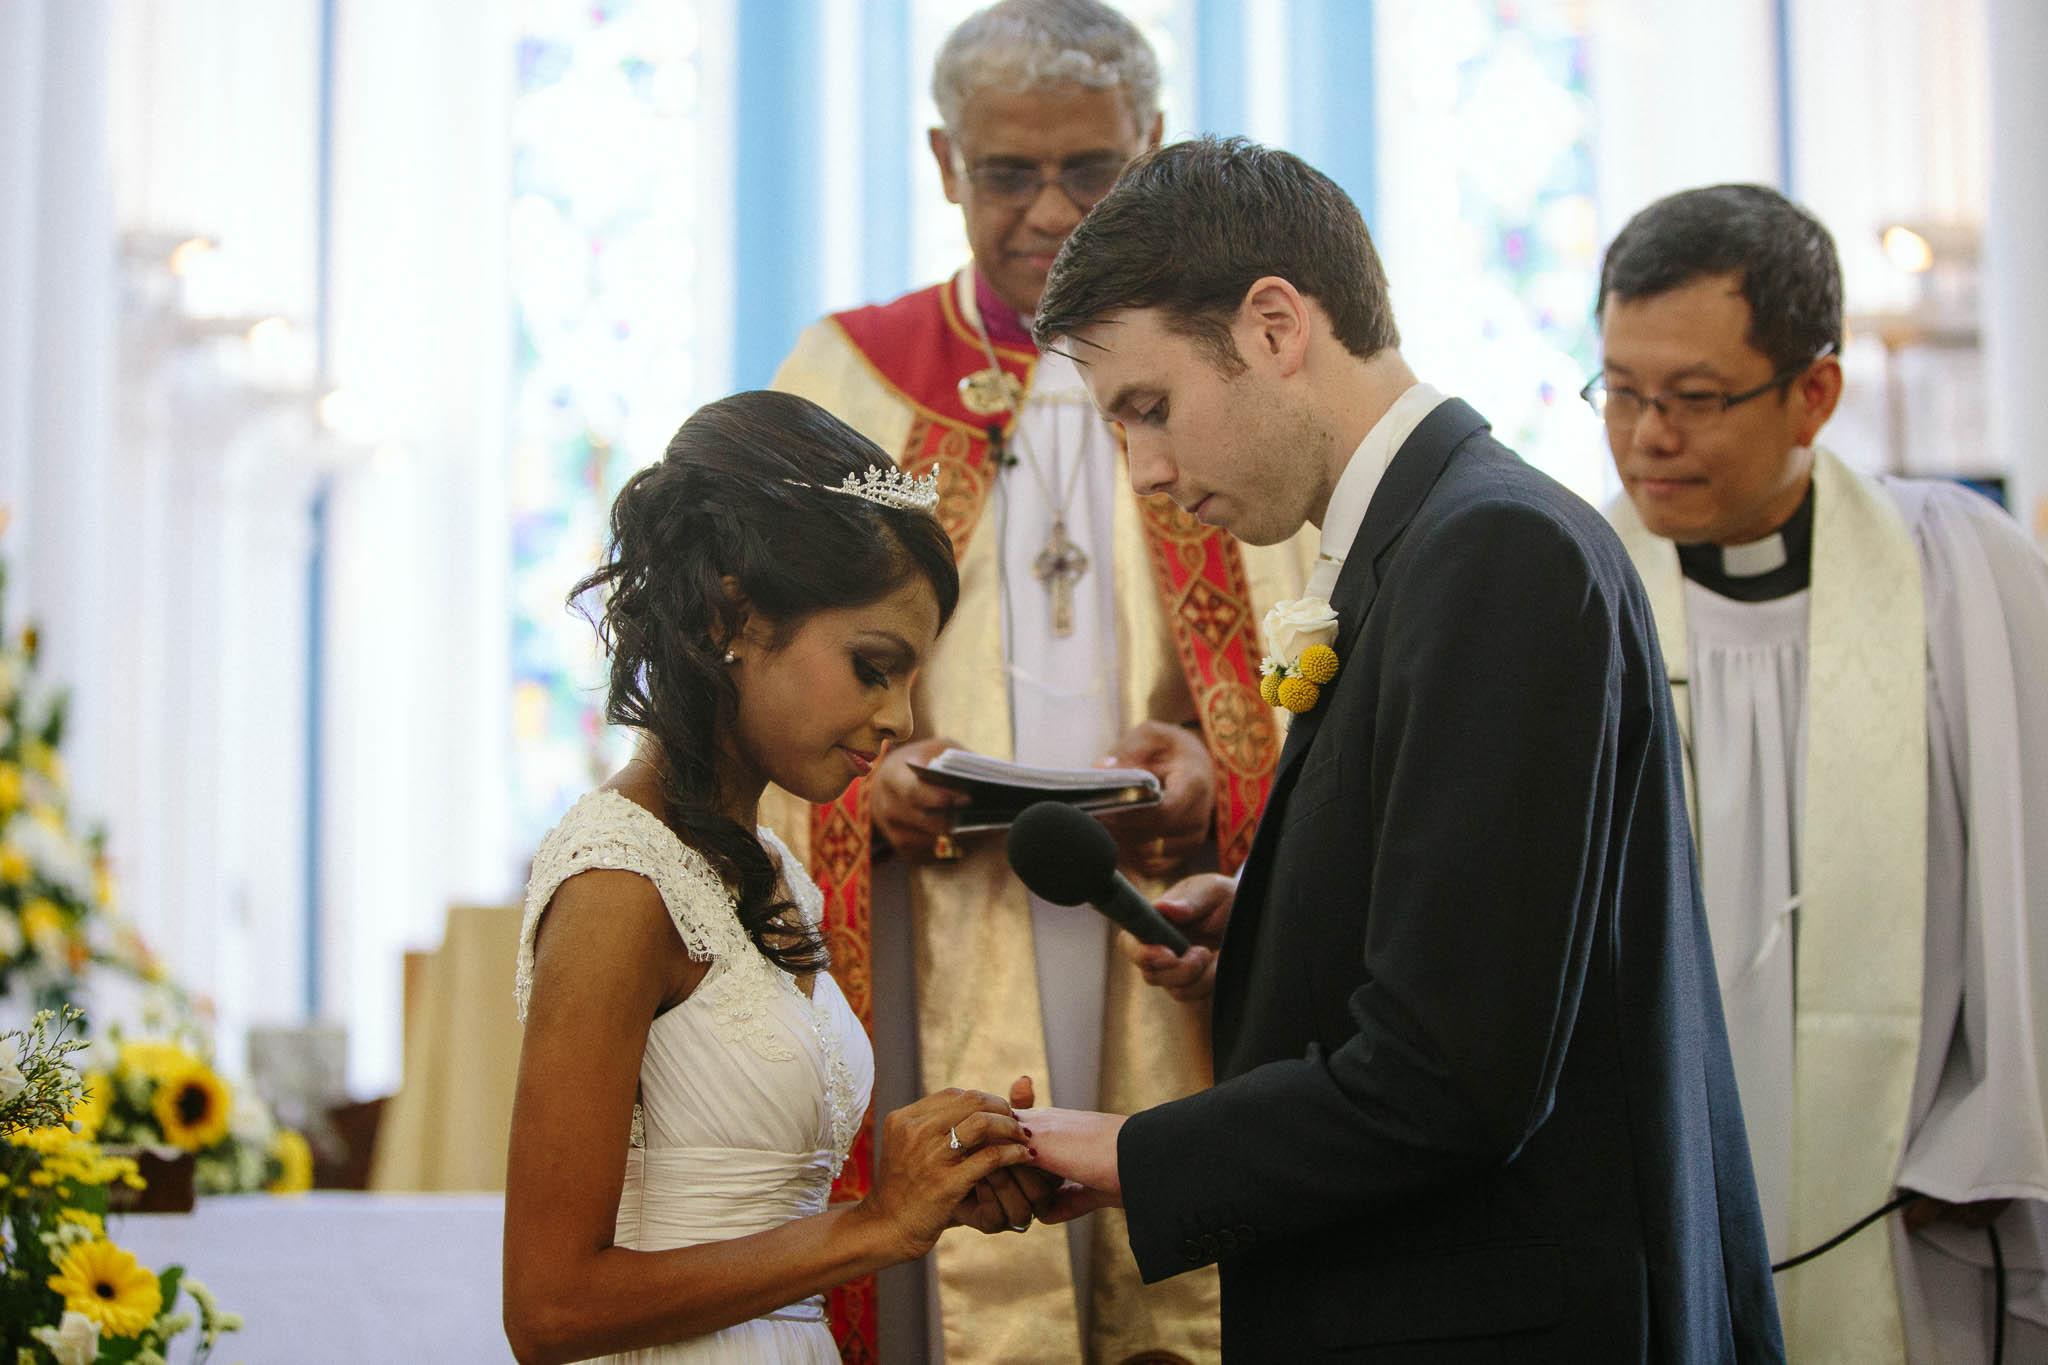 singapore-wedding-photographer-st-andrews-cathedral-renita-david-17.jpg